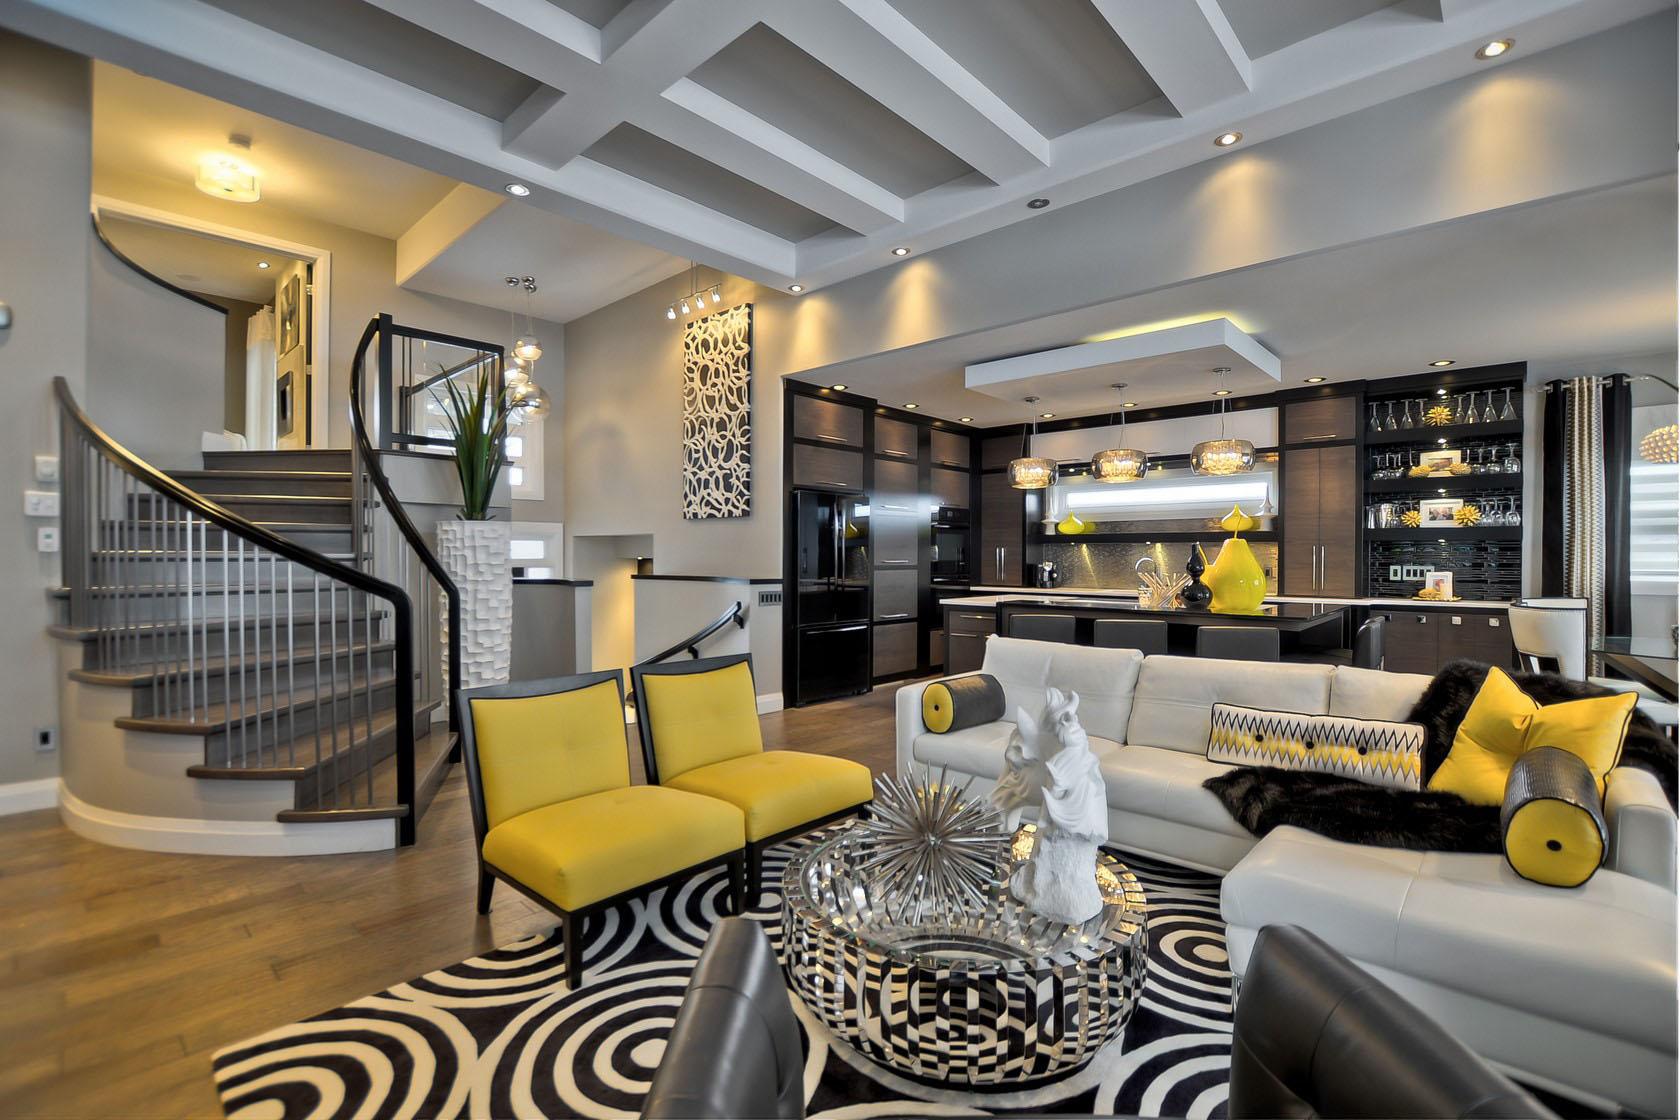 Contemporary Custom Dream Home In Saskatoon With Inspiring Interior Decor   iDesignArch ...